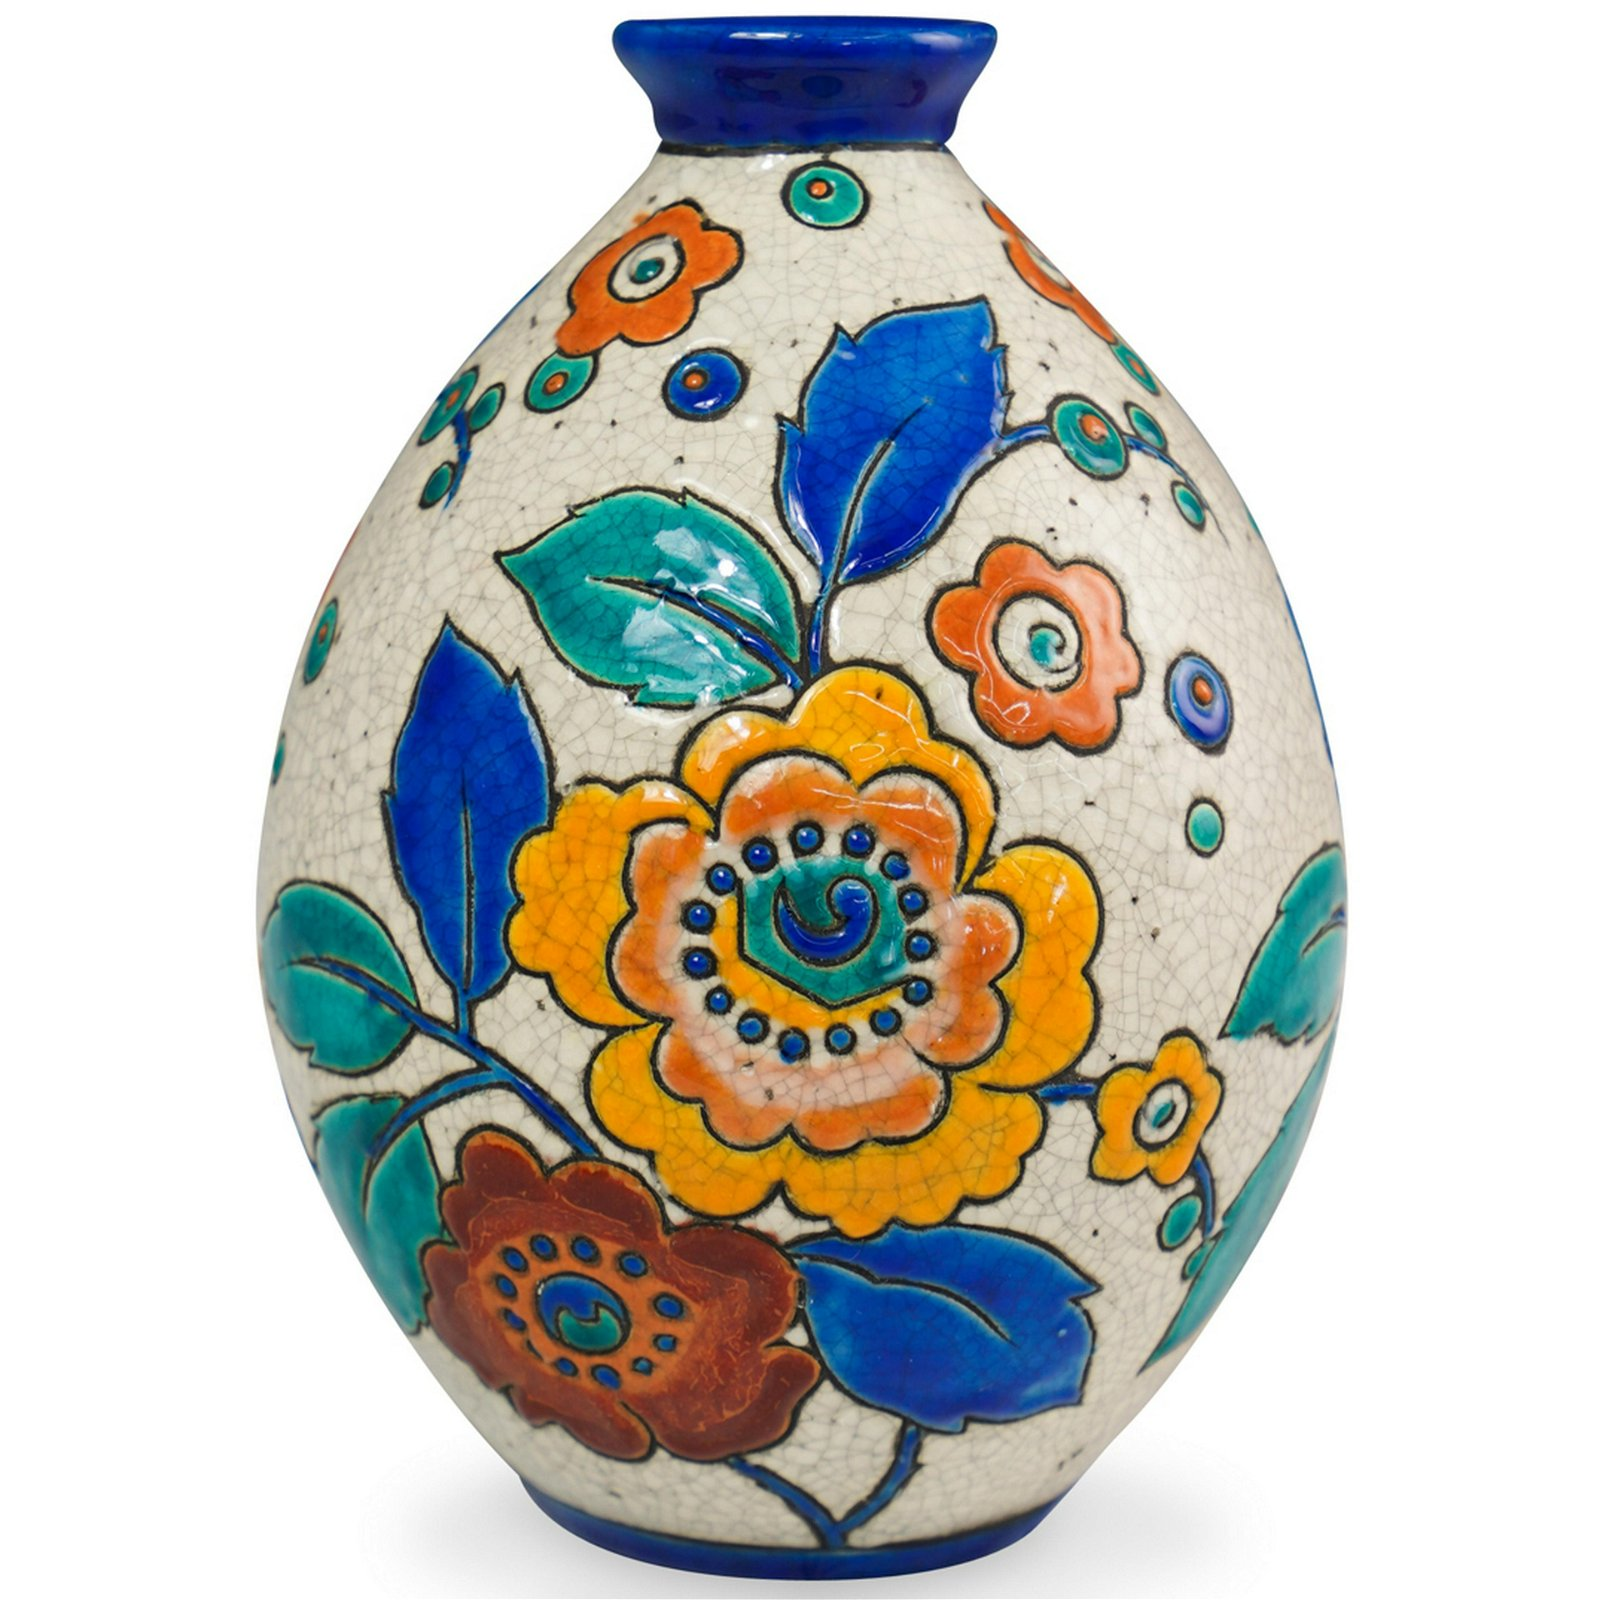 Boch Freres Keramis Ceramic Vase